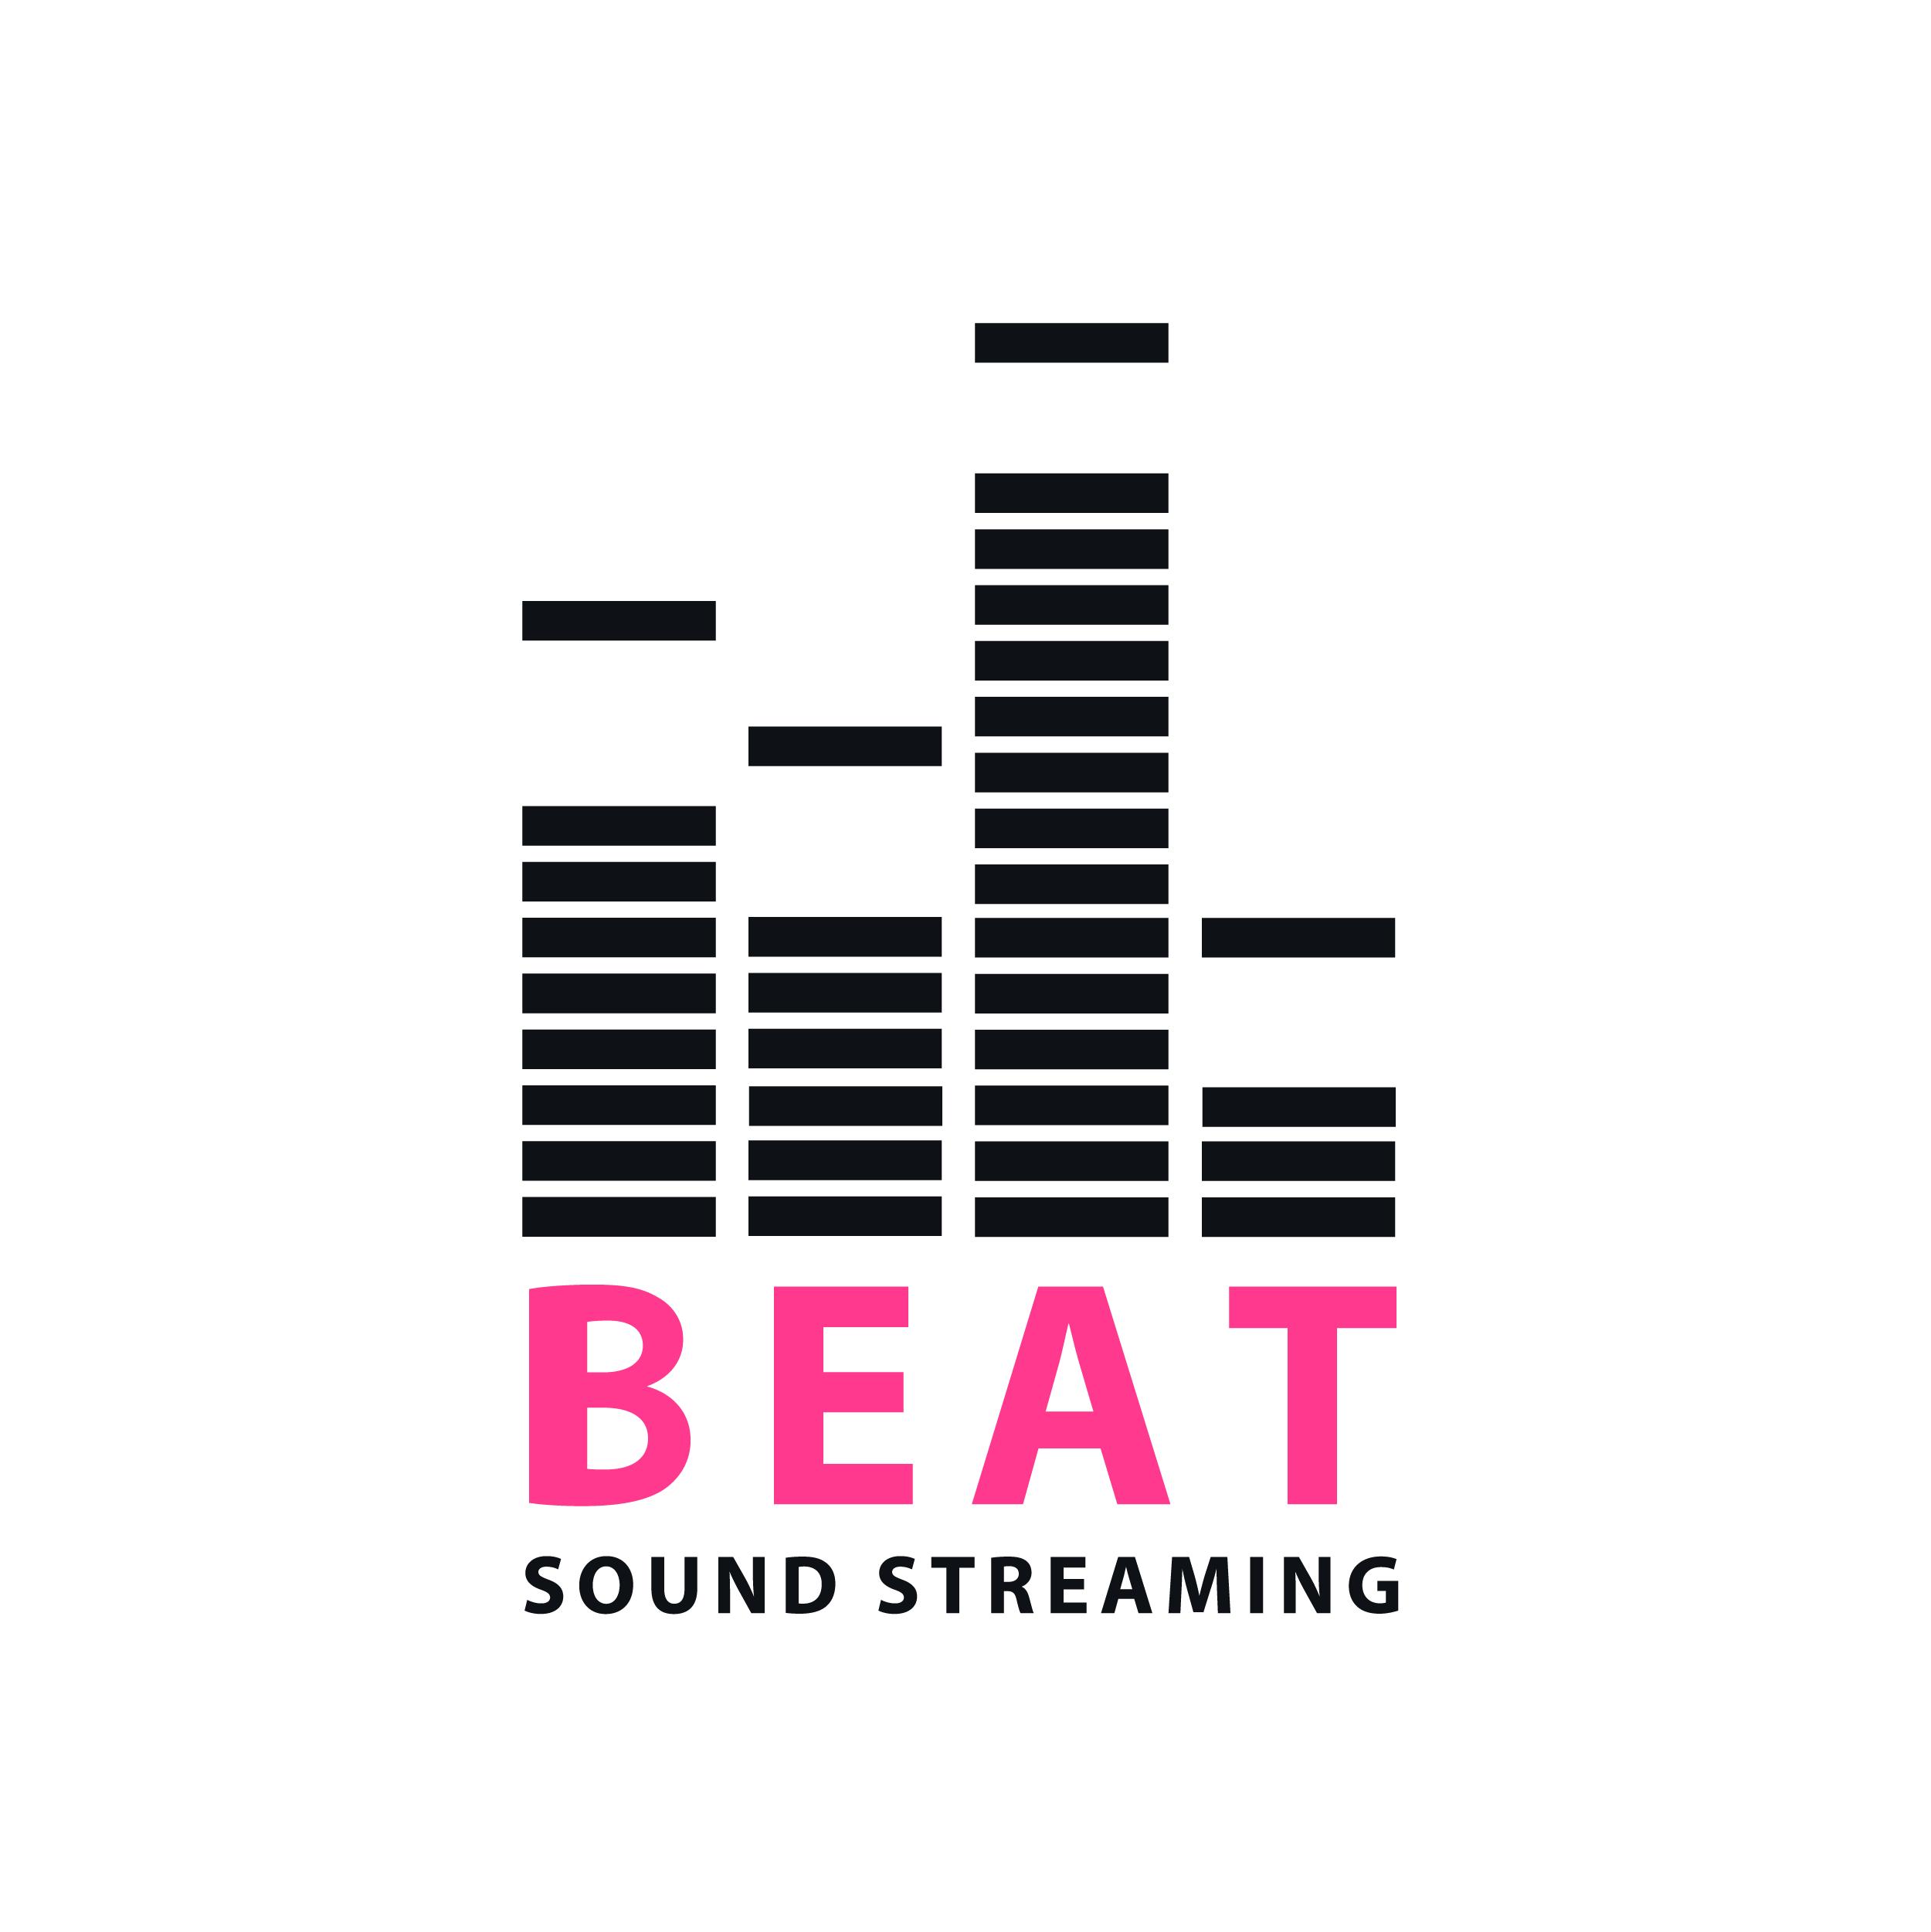 LogoFolio - Beat-01